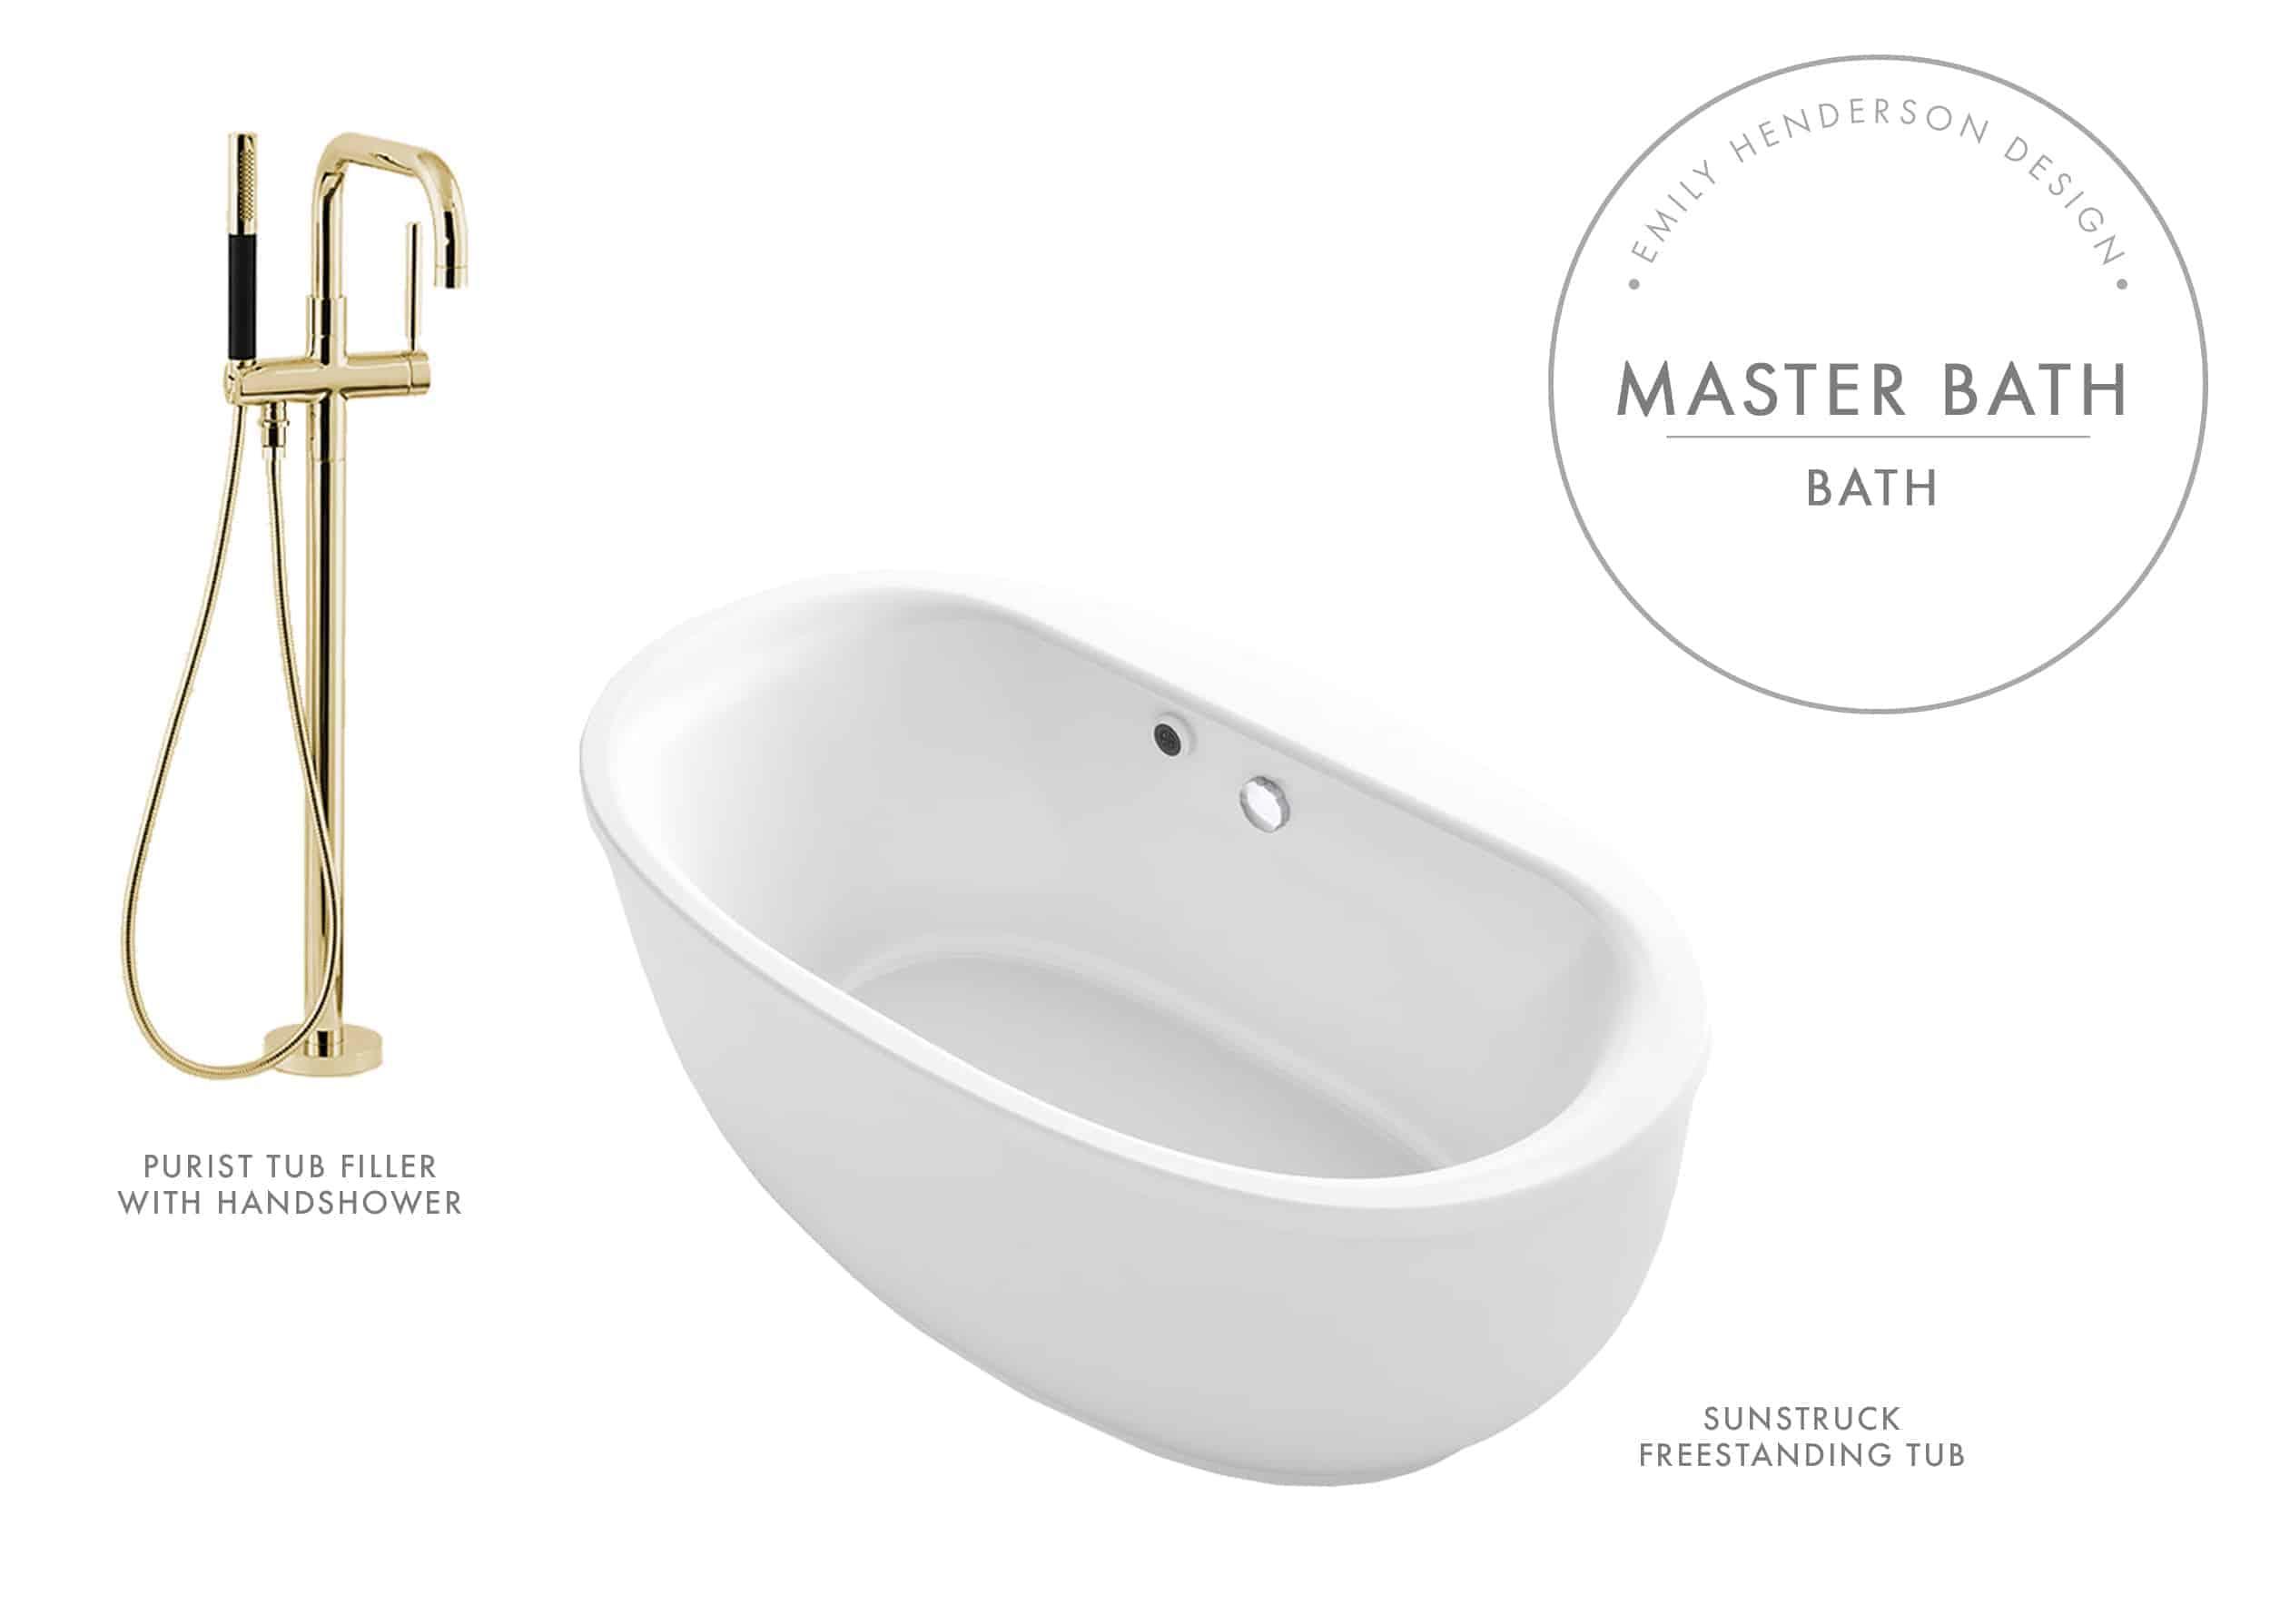 Emily Henderson Mountain Fixer Upper I Design You Decide Master Bath Final Kohler Product Bath Sunstruck